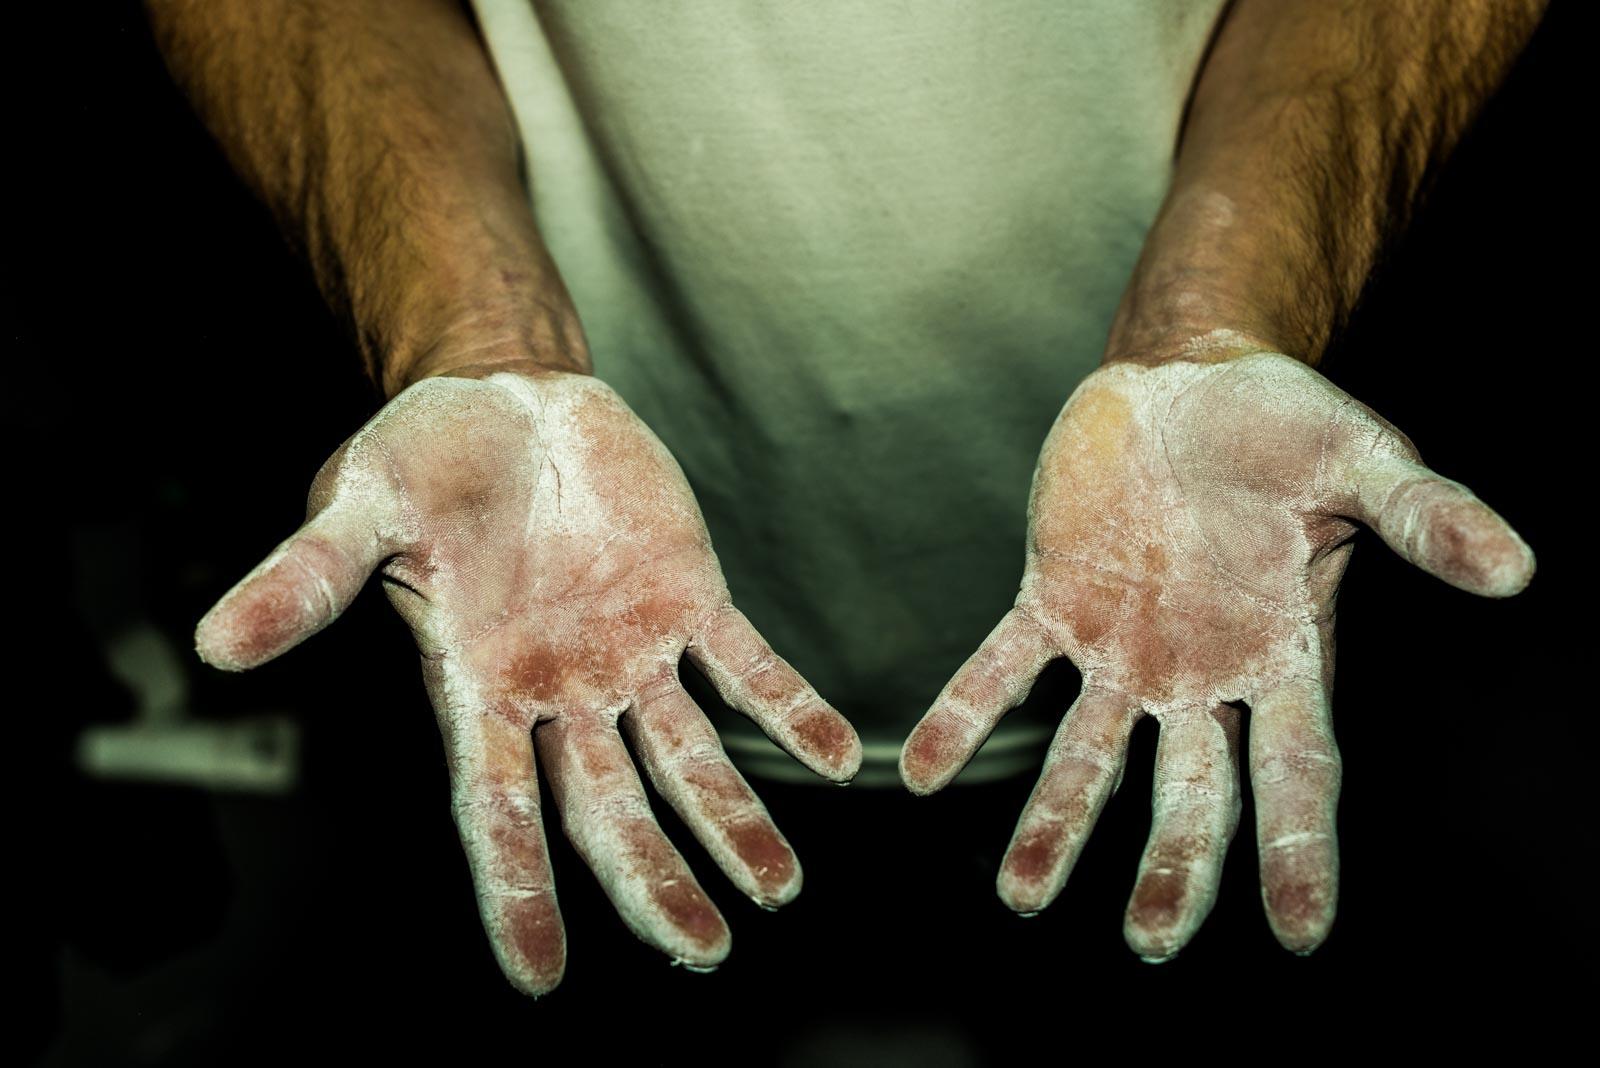 Hands of USA climber Carlo Traversi